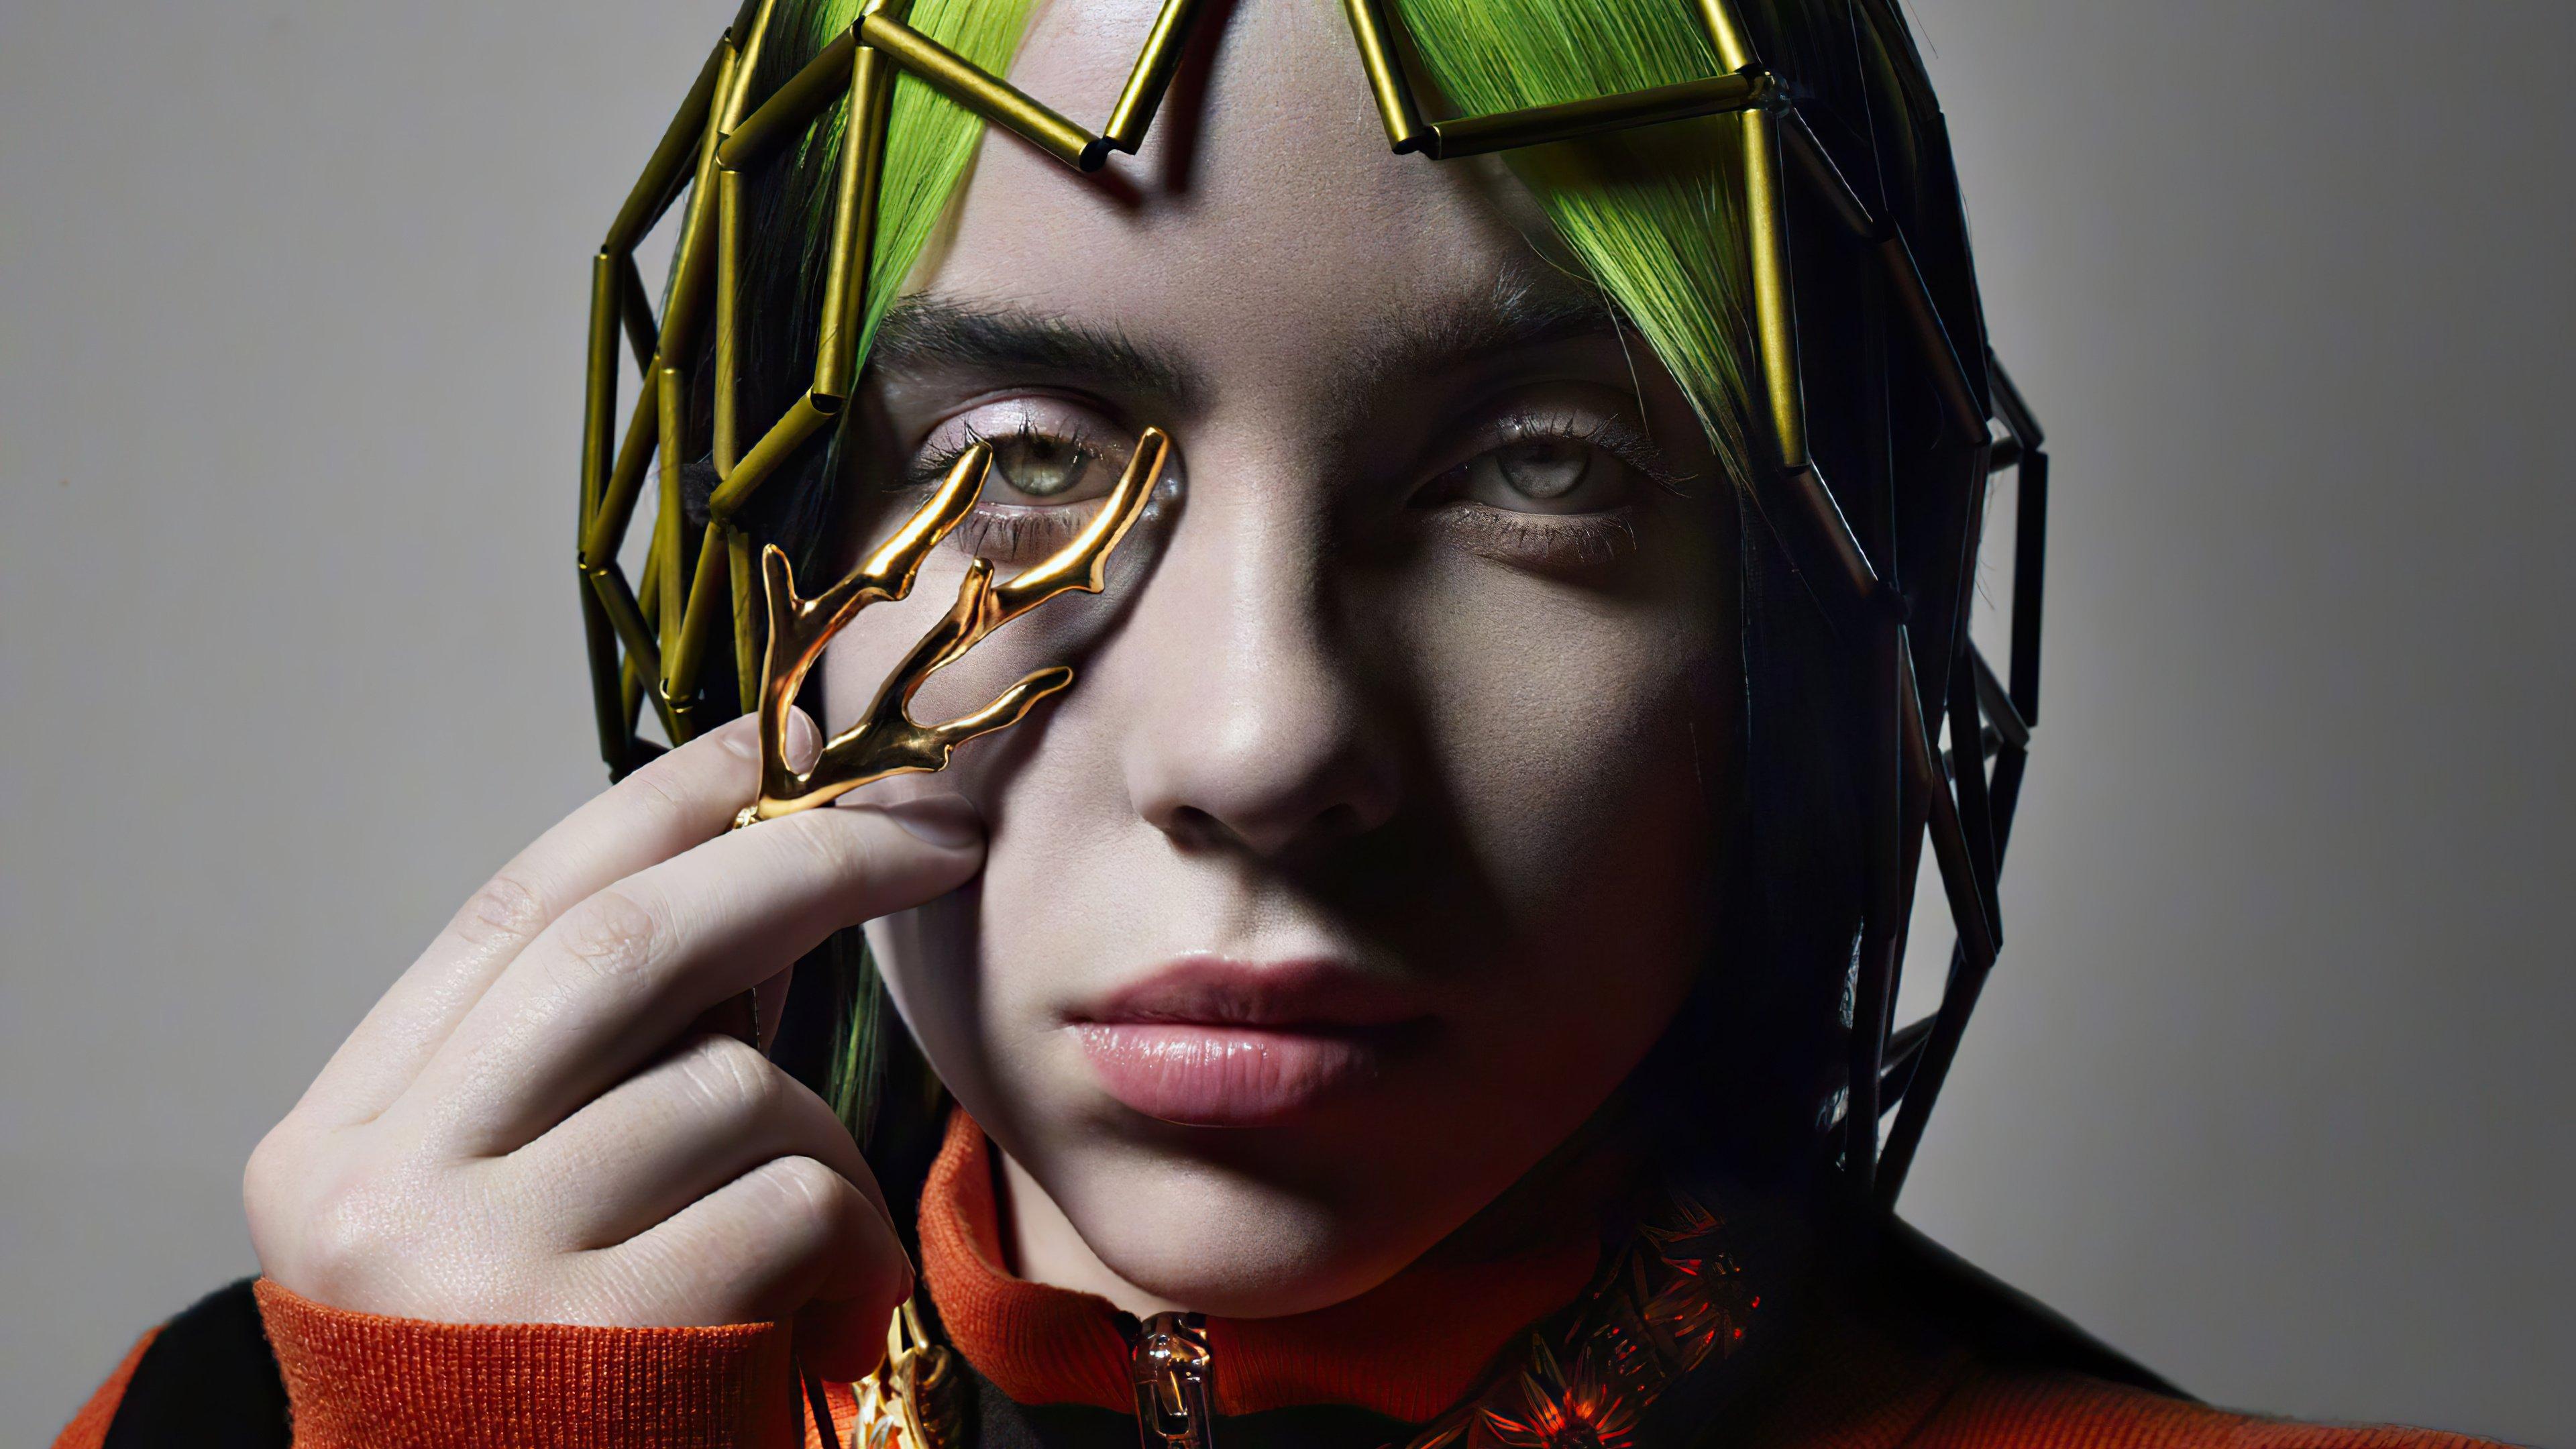 Fondos de pantalla Billie Eilish Photoshoot para Vogue